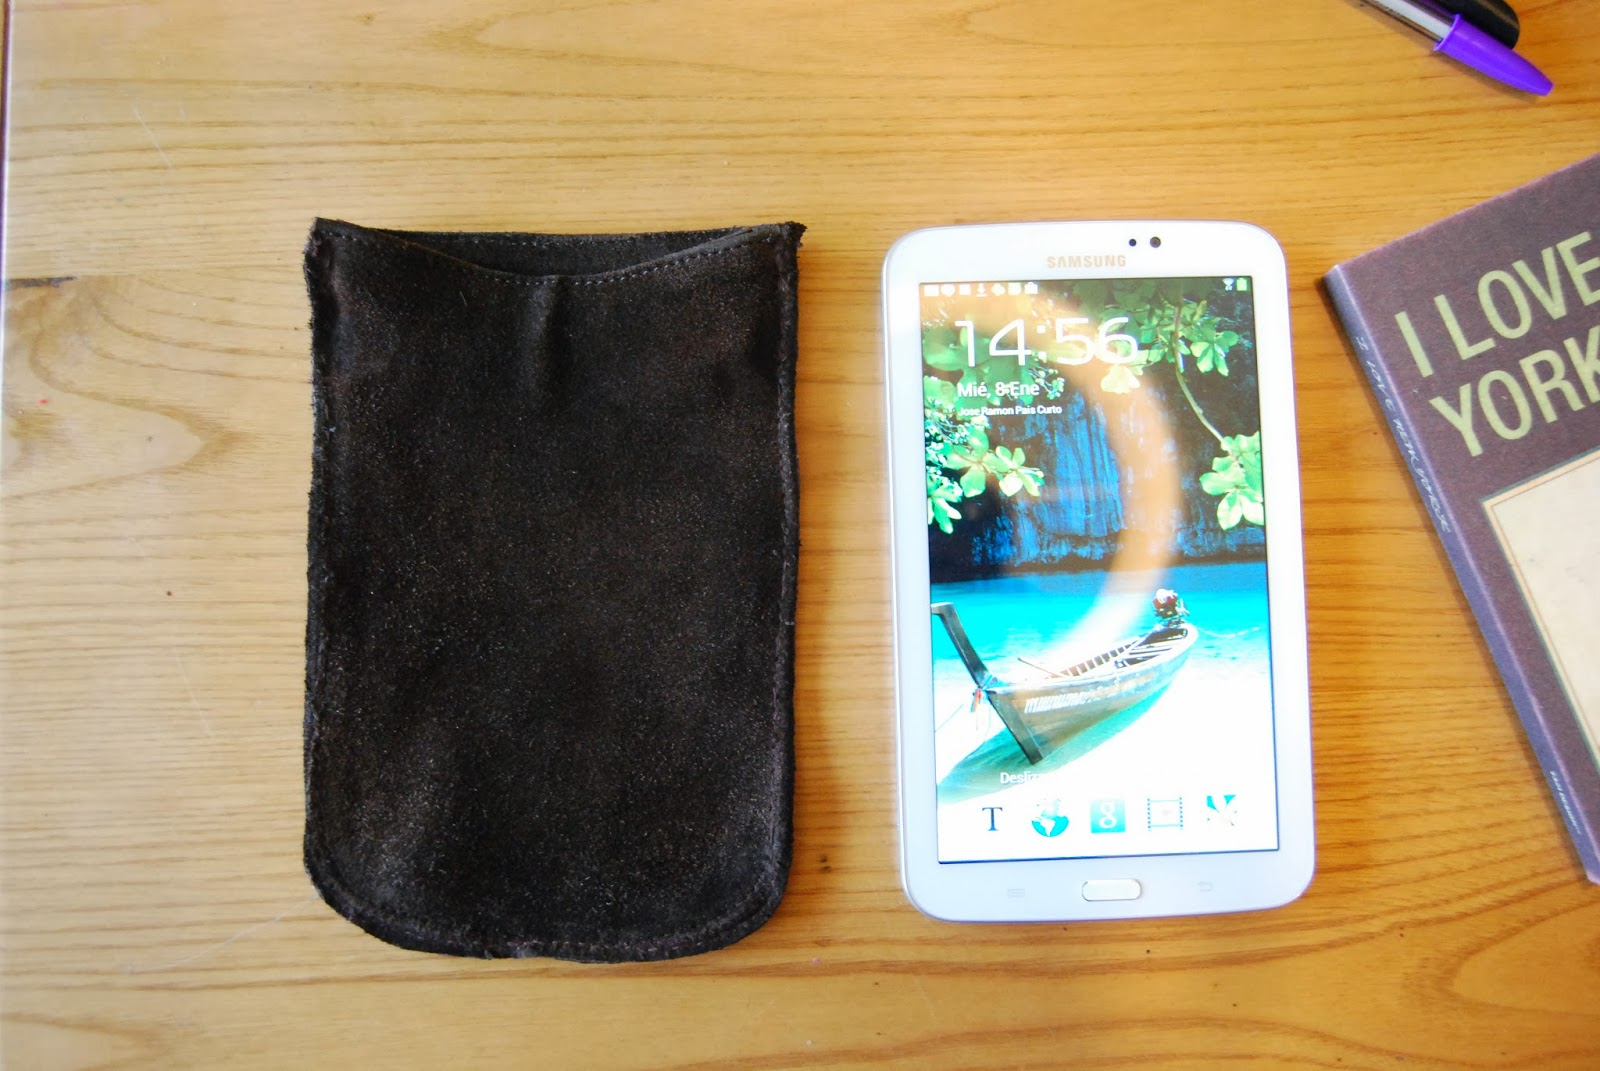 http://sosunnyblog.blogspot.com.es/2014/01/funda-para-tablet-recicladisima-diy.html